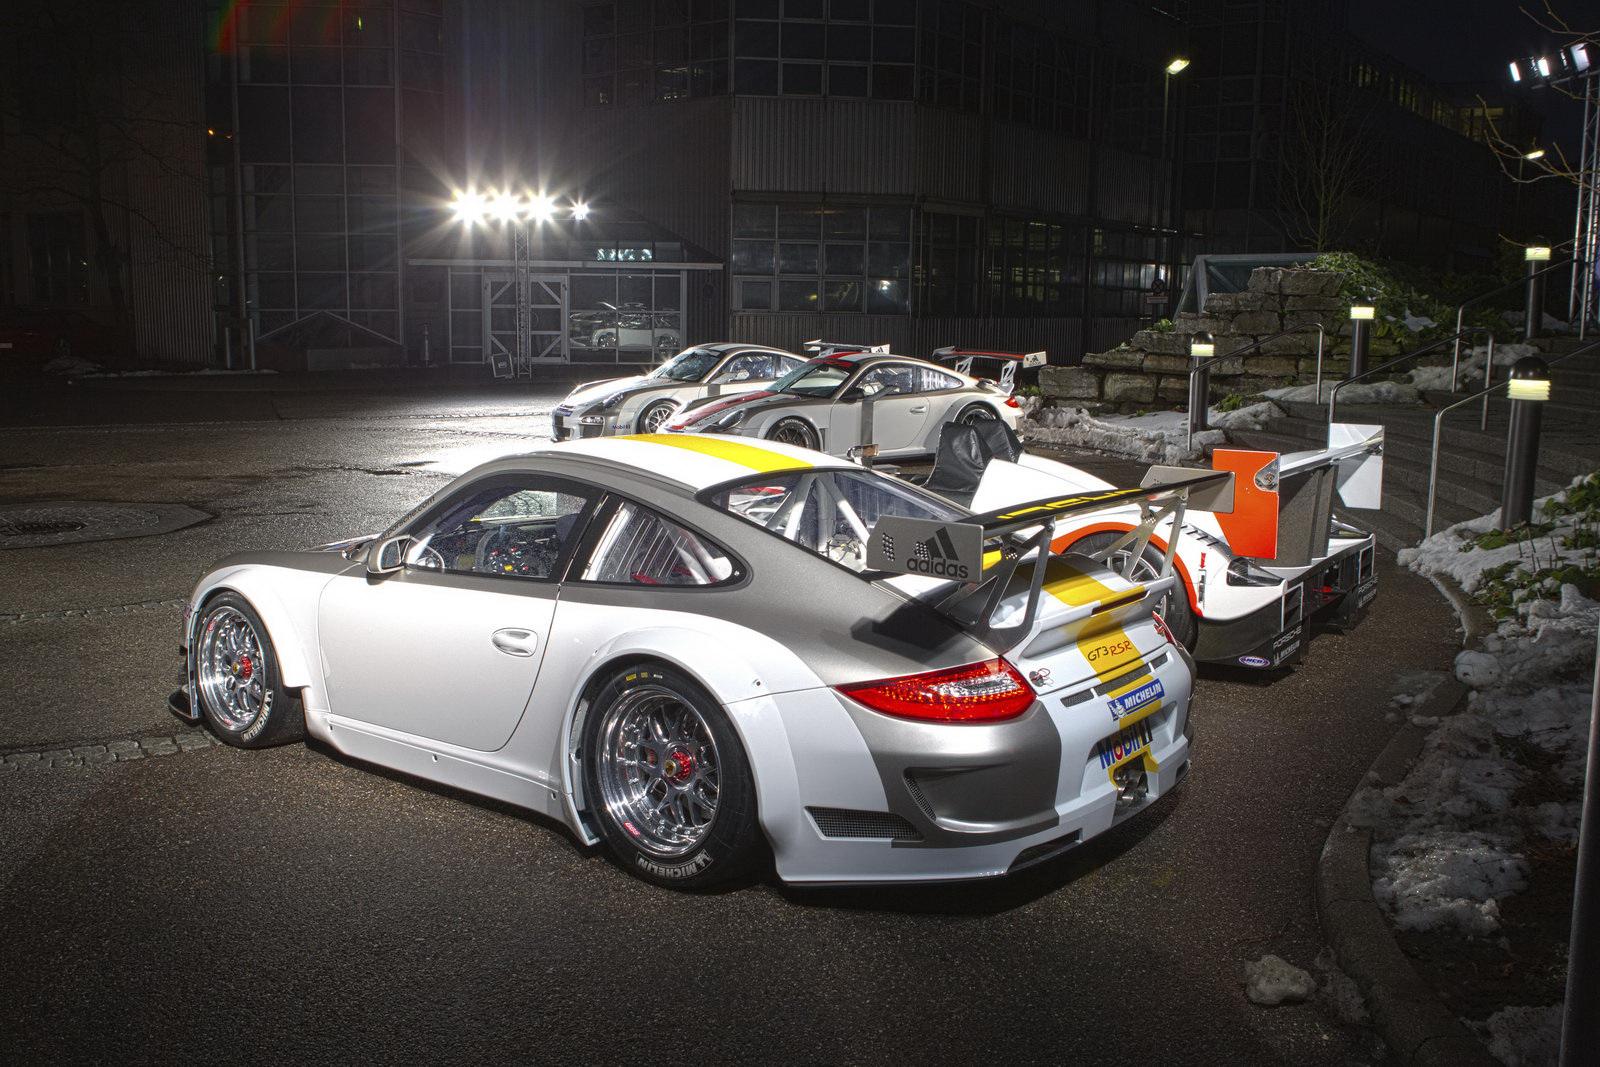 Porsche Launches The 2011 Gt3 Rsr Evo Race Car